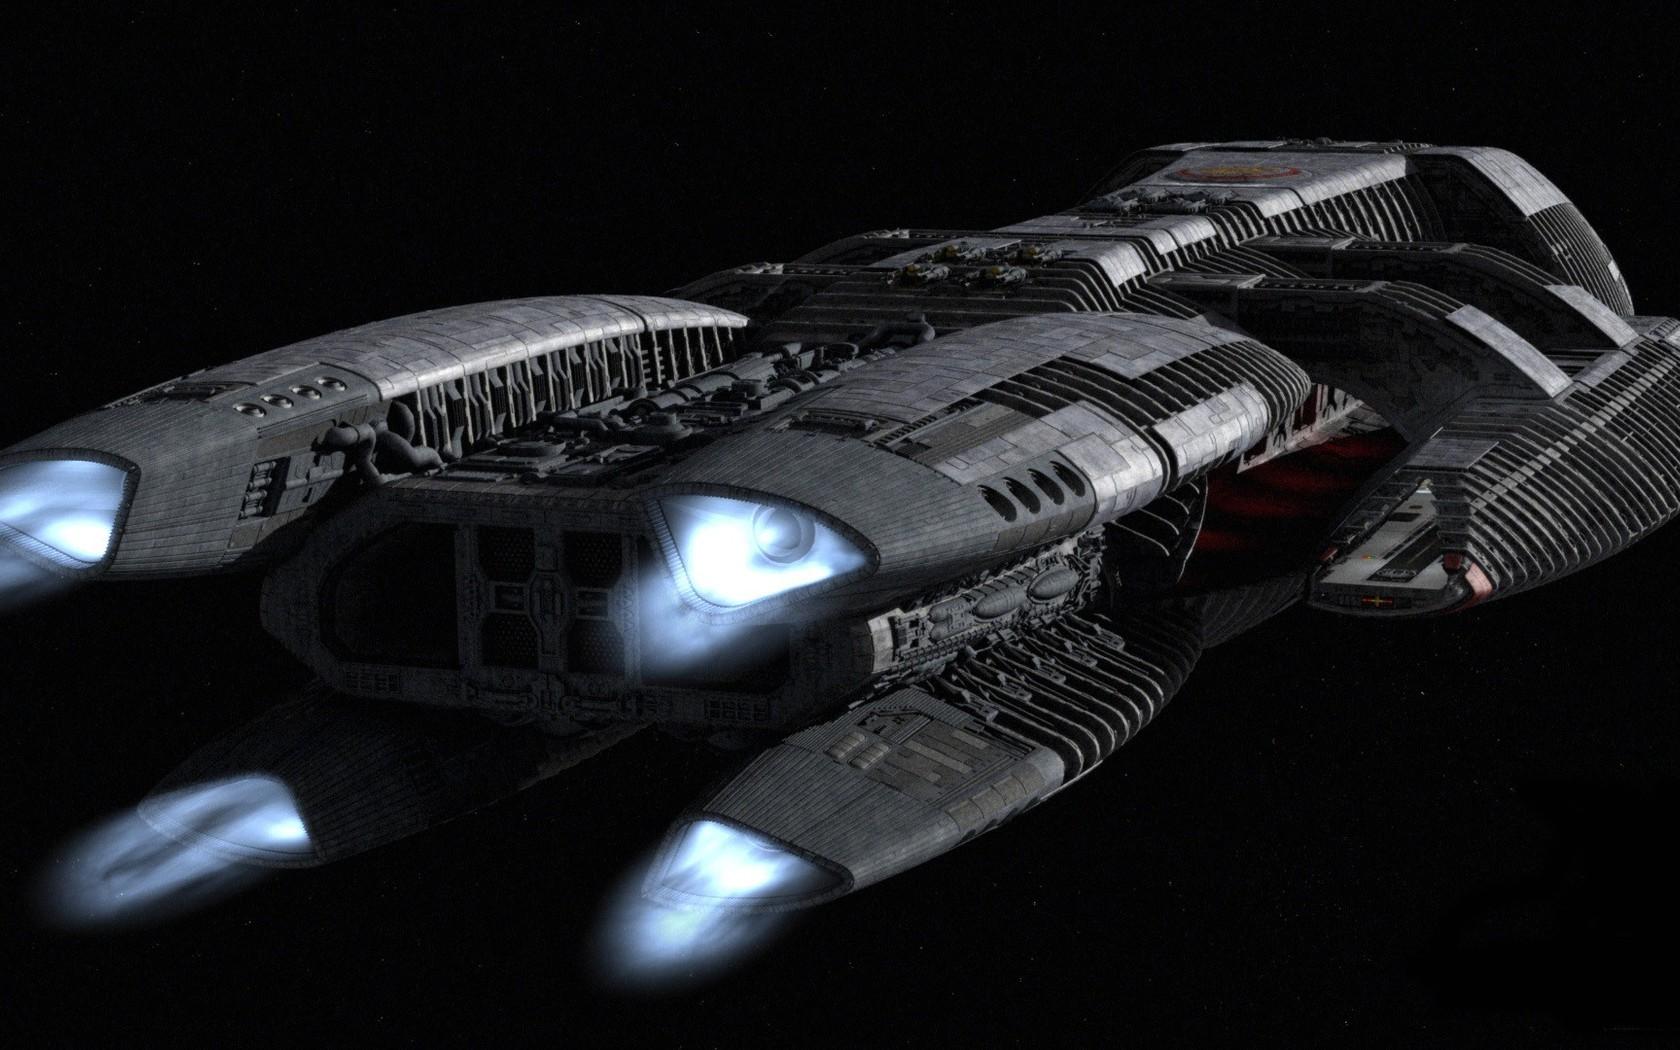 Spaceship wallpaper 5269 1680x1050